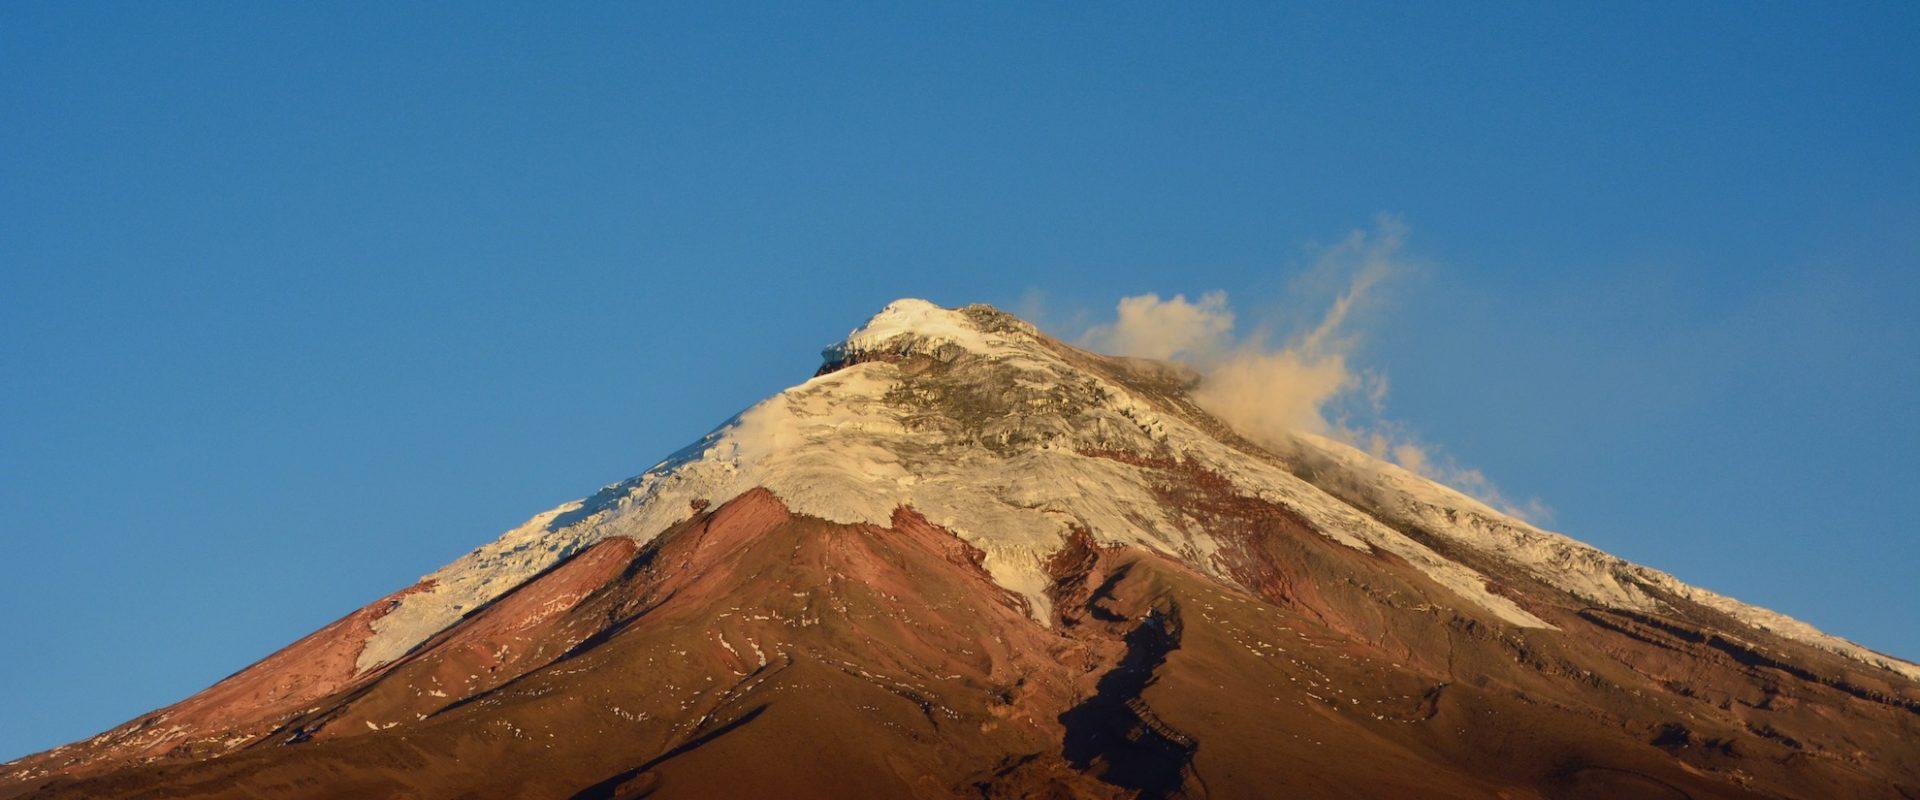 Permalink auf:Südamerika